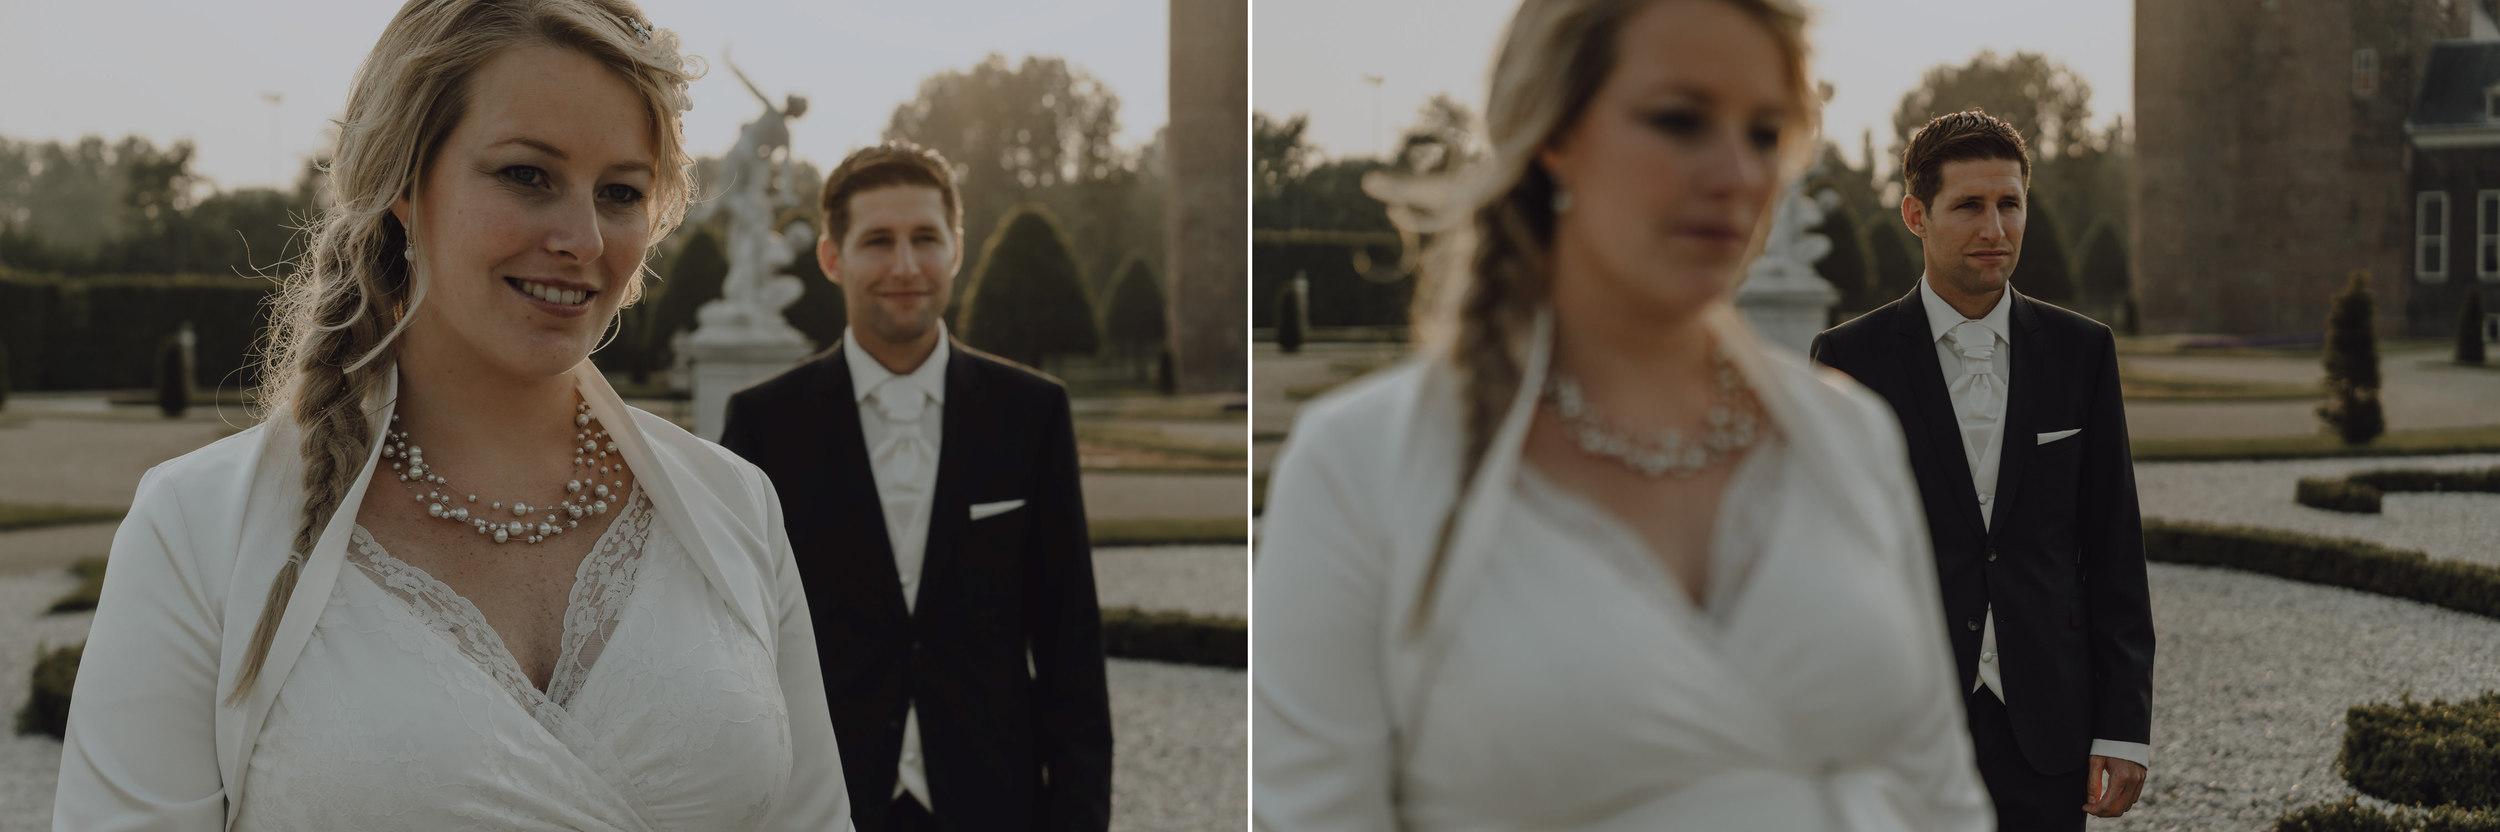 bruidsfotografie-amsterdam-utrecht-mark-hadden-wedding-photography-rowan-gideon-498 copy.jpg